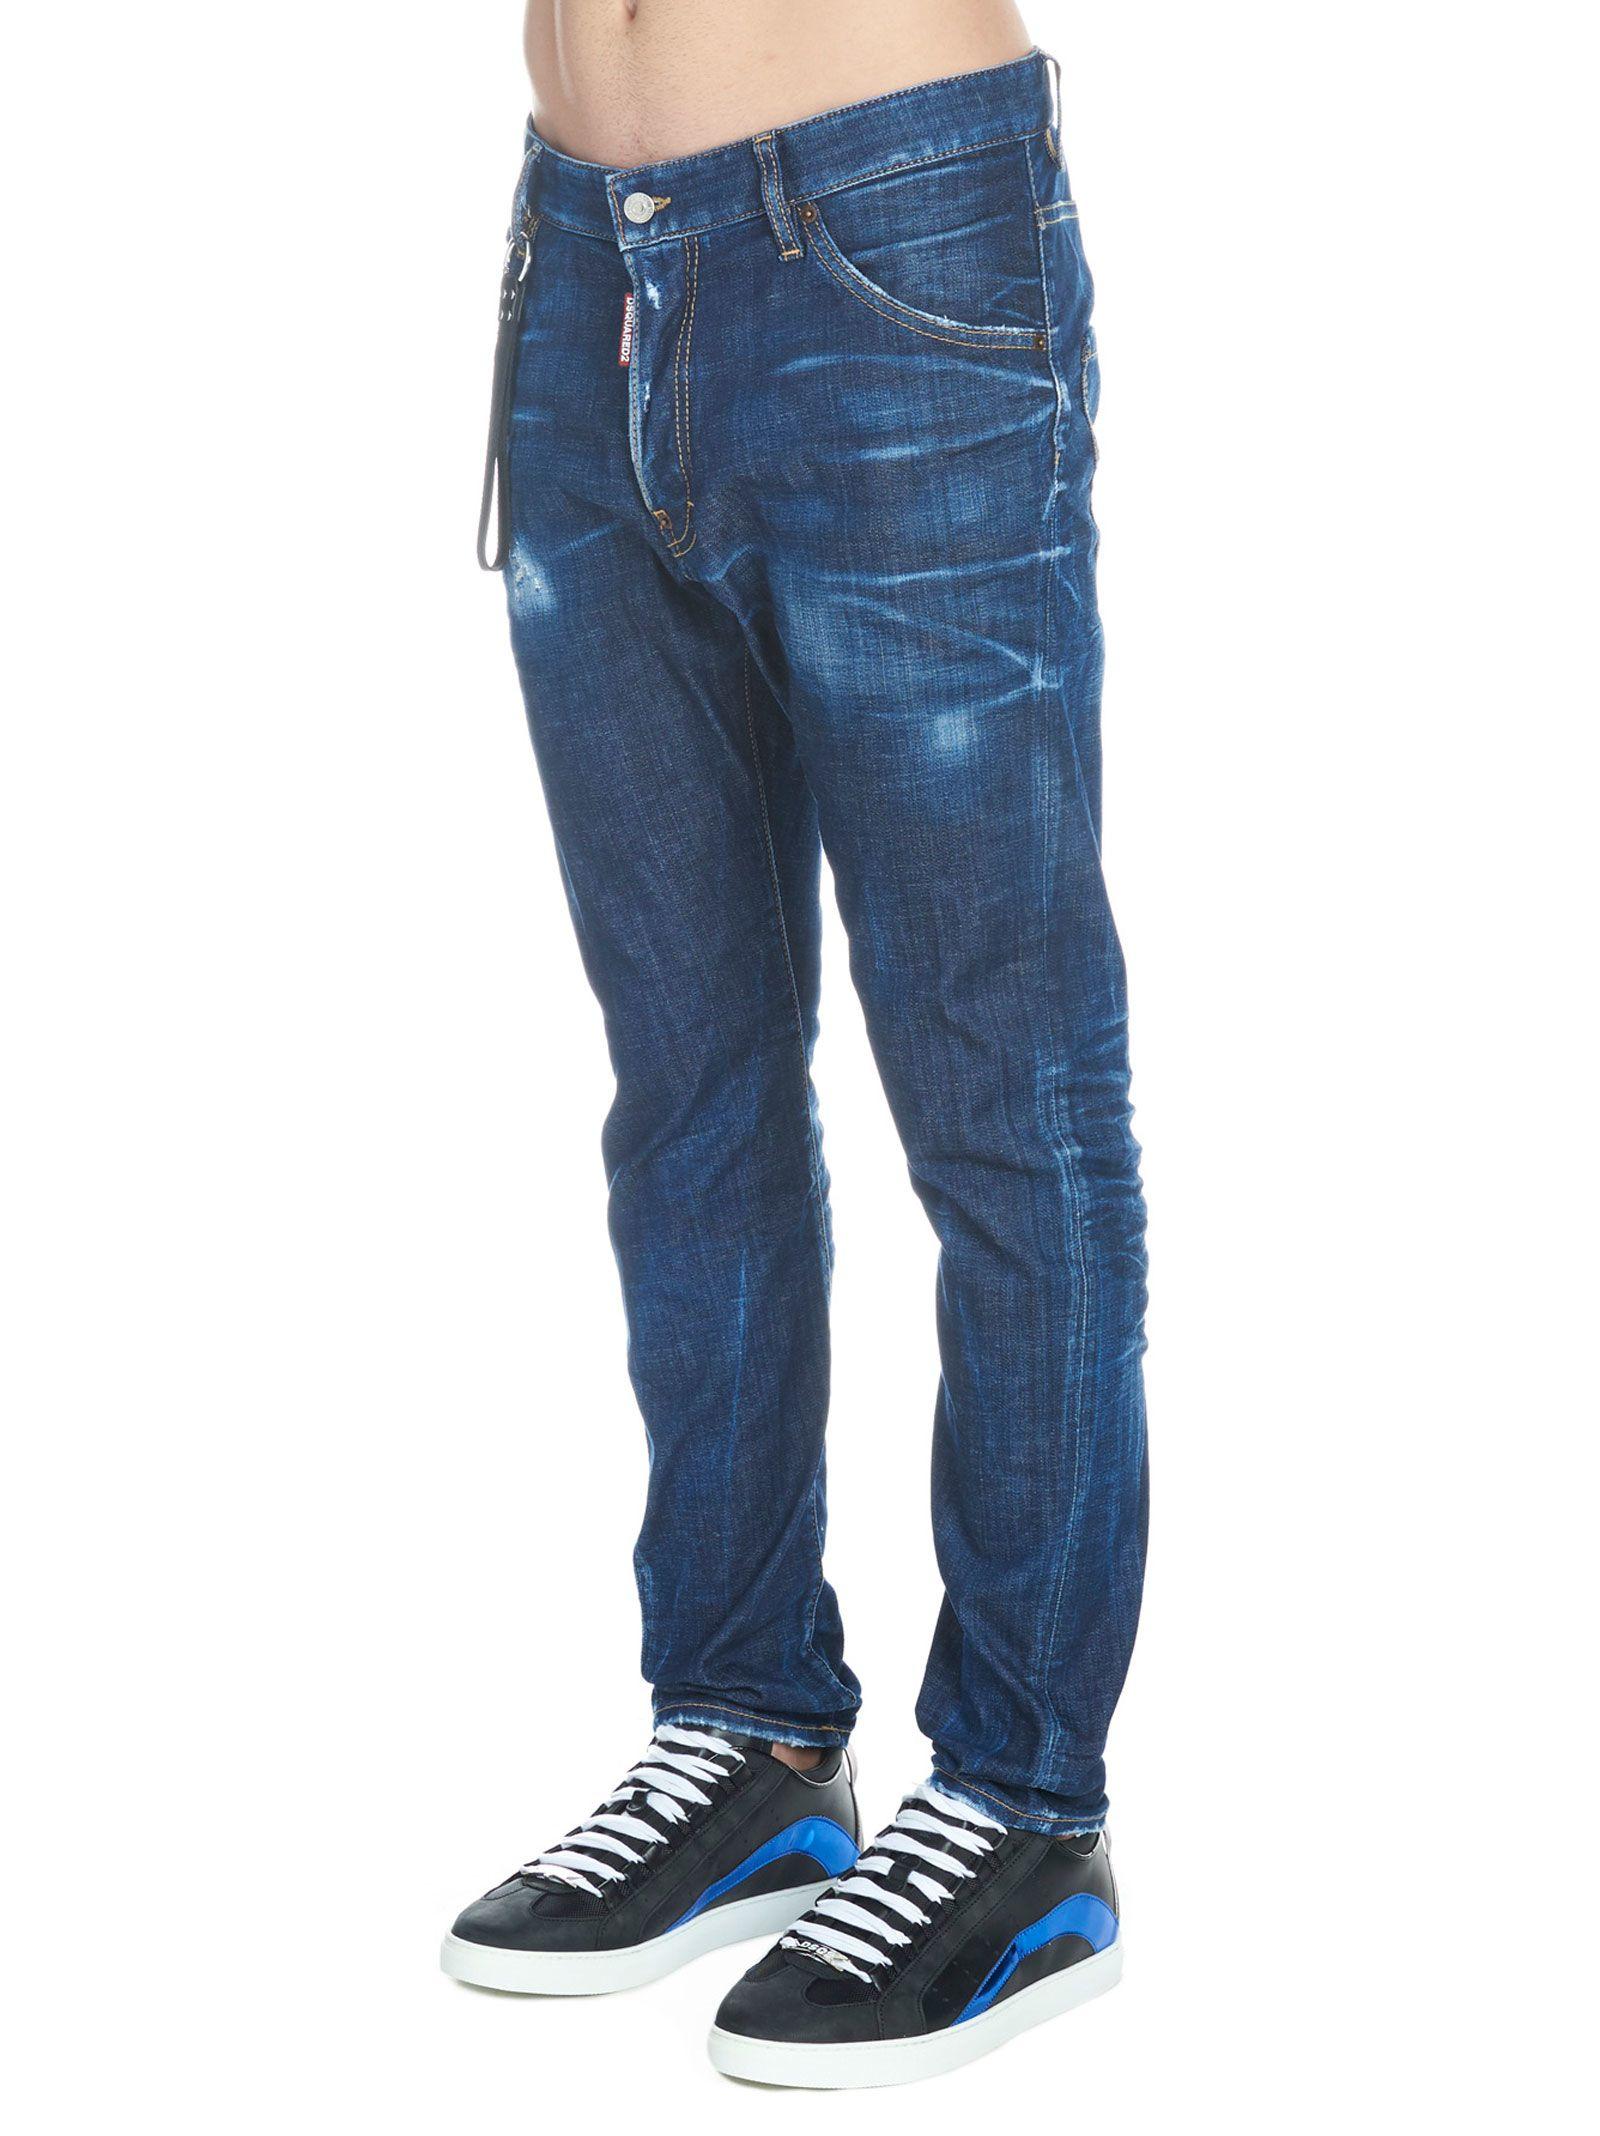 Dsquared2 Dsquared2  classic Kenny Twist  Jeans - Blue - 10801046 ... ad94f5635a8d